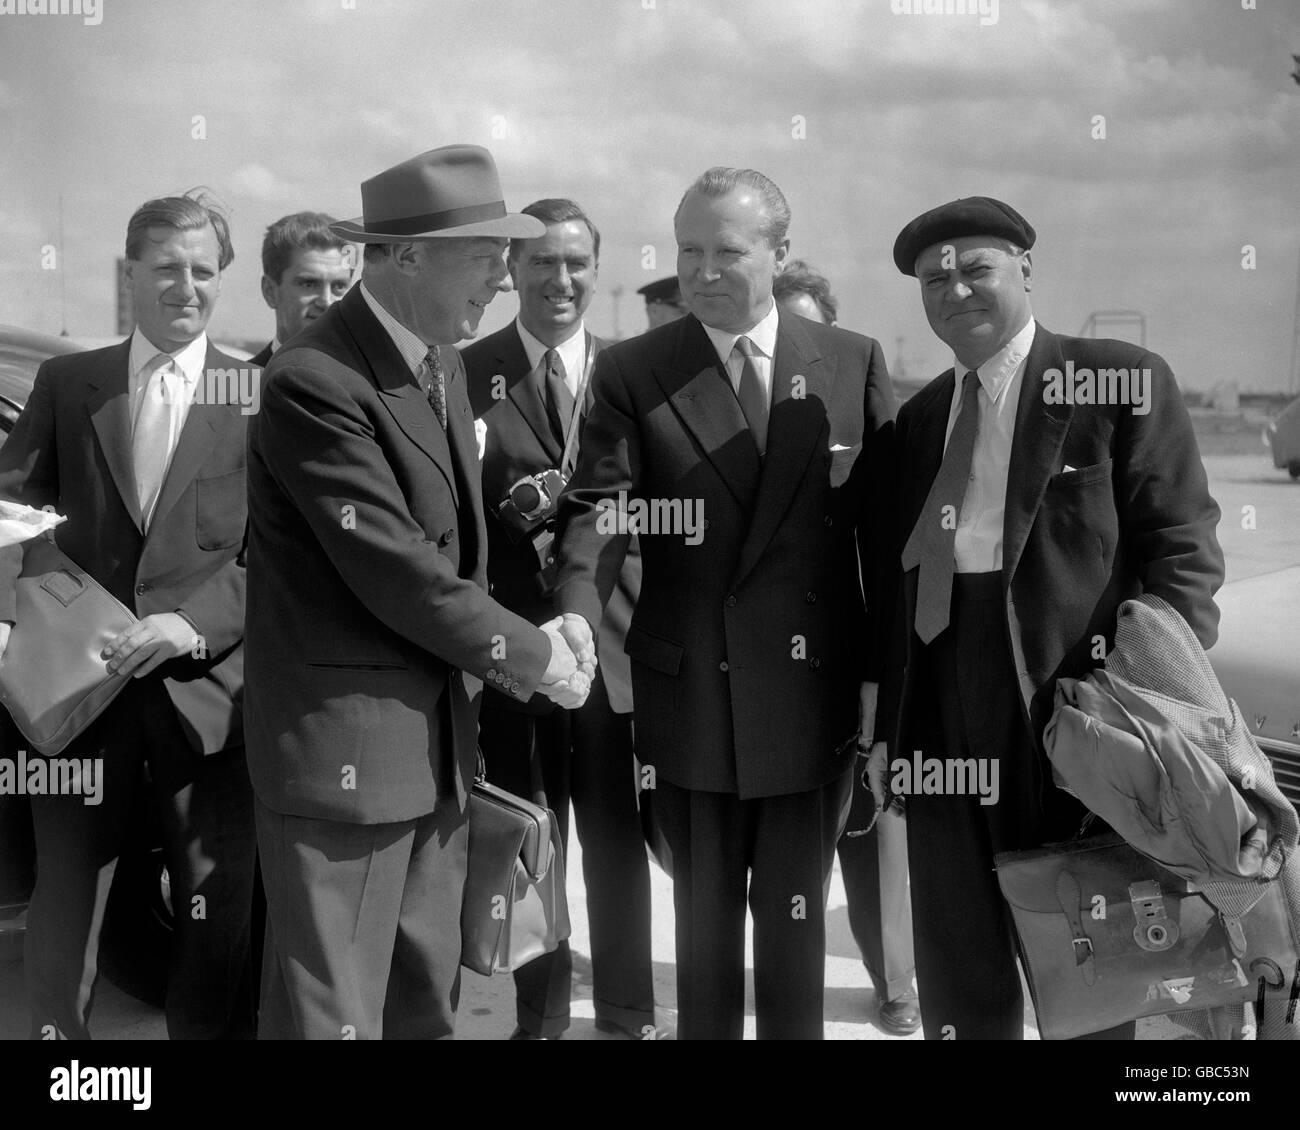 Politics - Hugh Gaitskell and Aneurin Bevan - 1959 - Stock Image